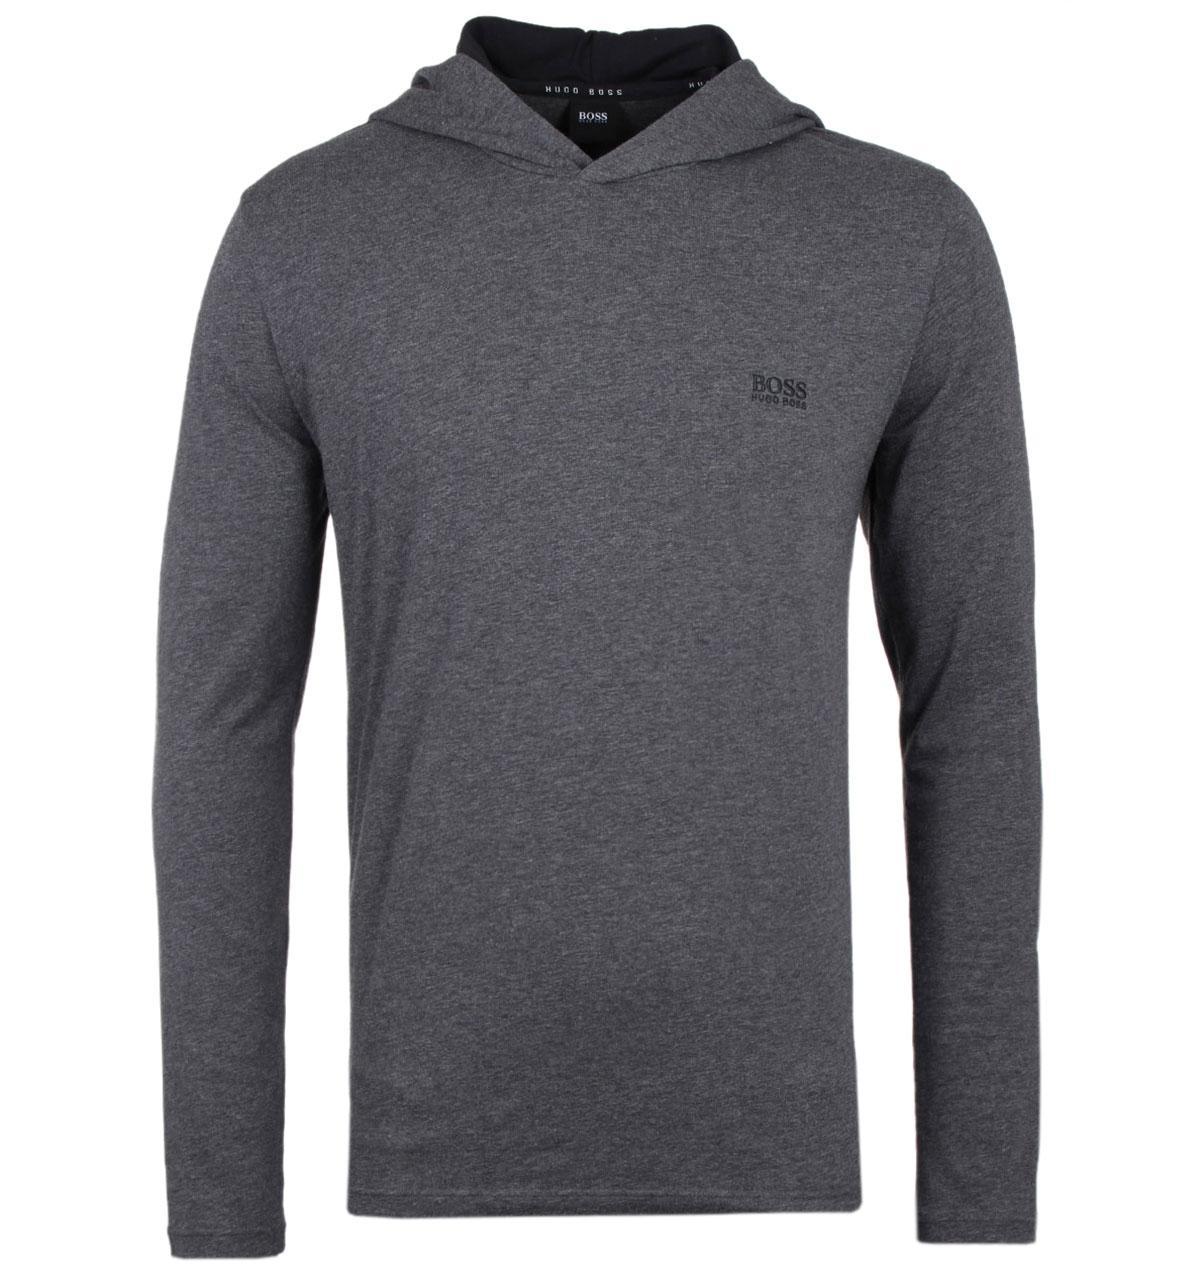 2e9ec112 BOSS by Hugo Boss Charcoal Hooded Long Sleeve T-shirt in Gray for ...